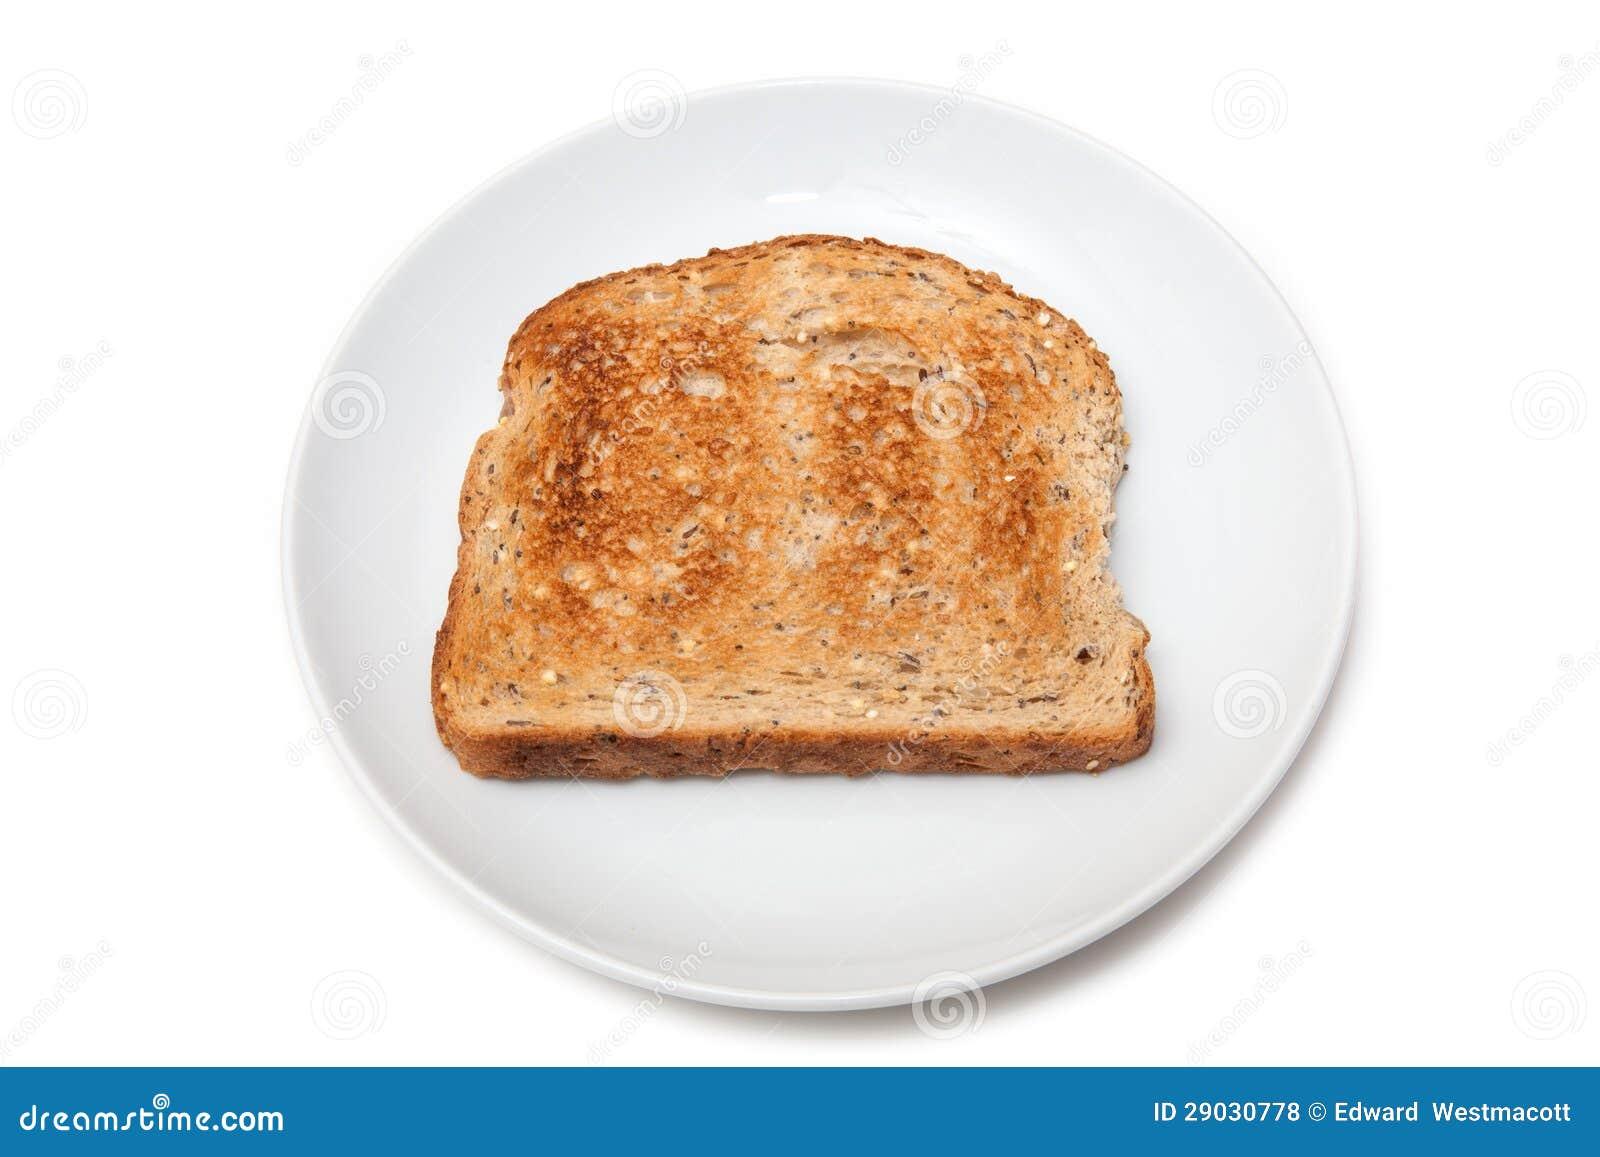 slice of toast on plate stock photo image of background 29030778